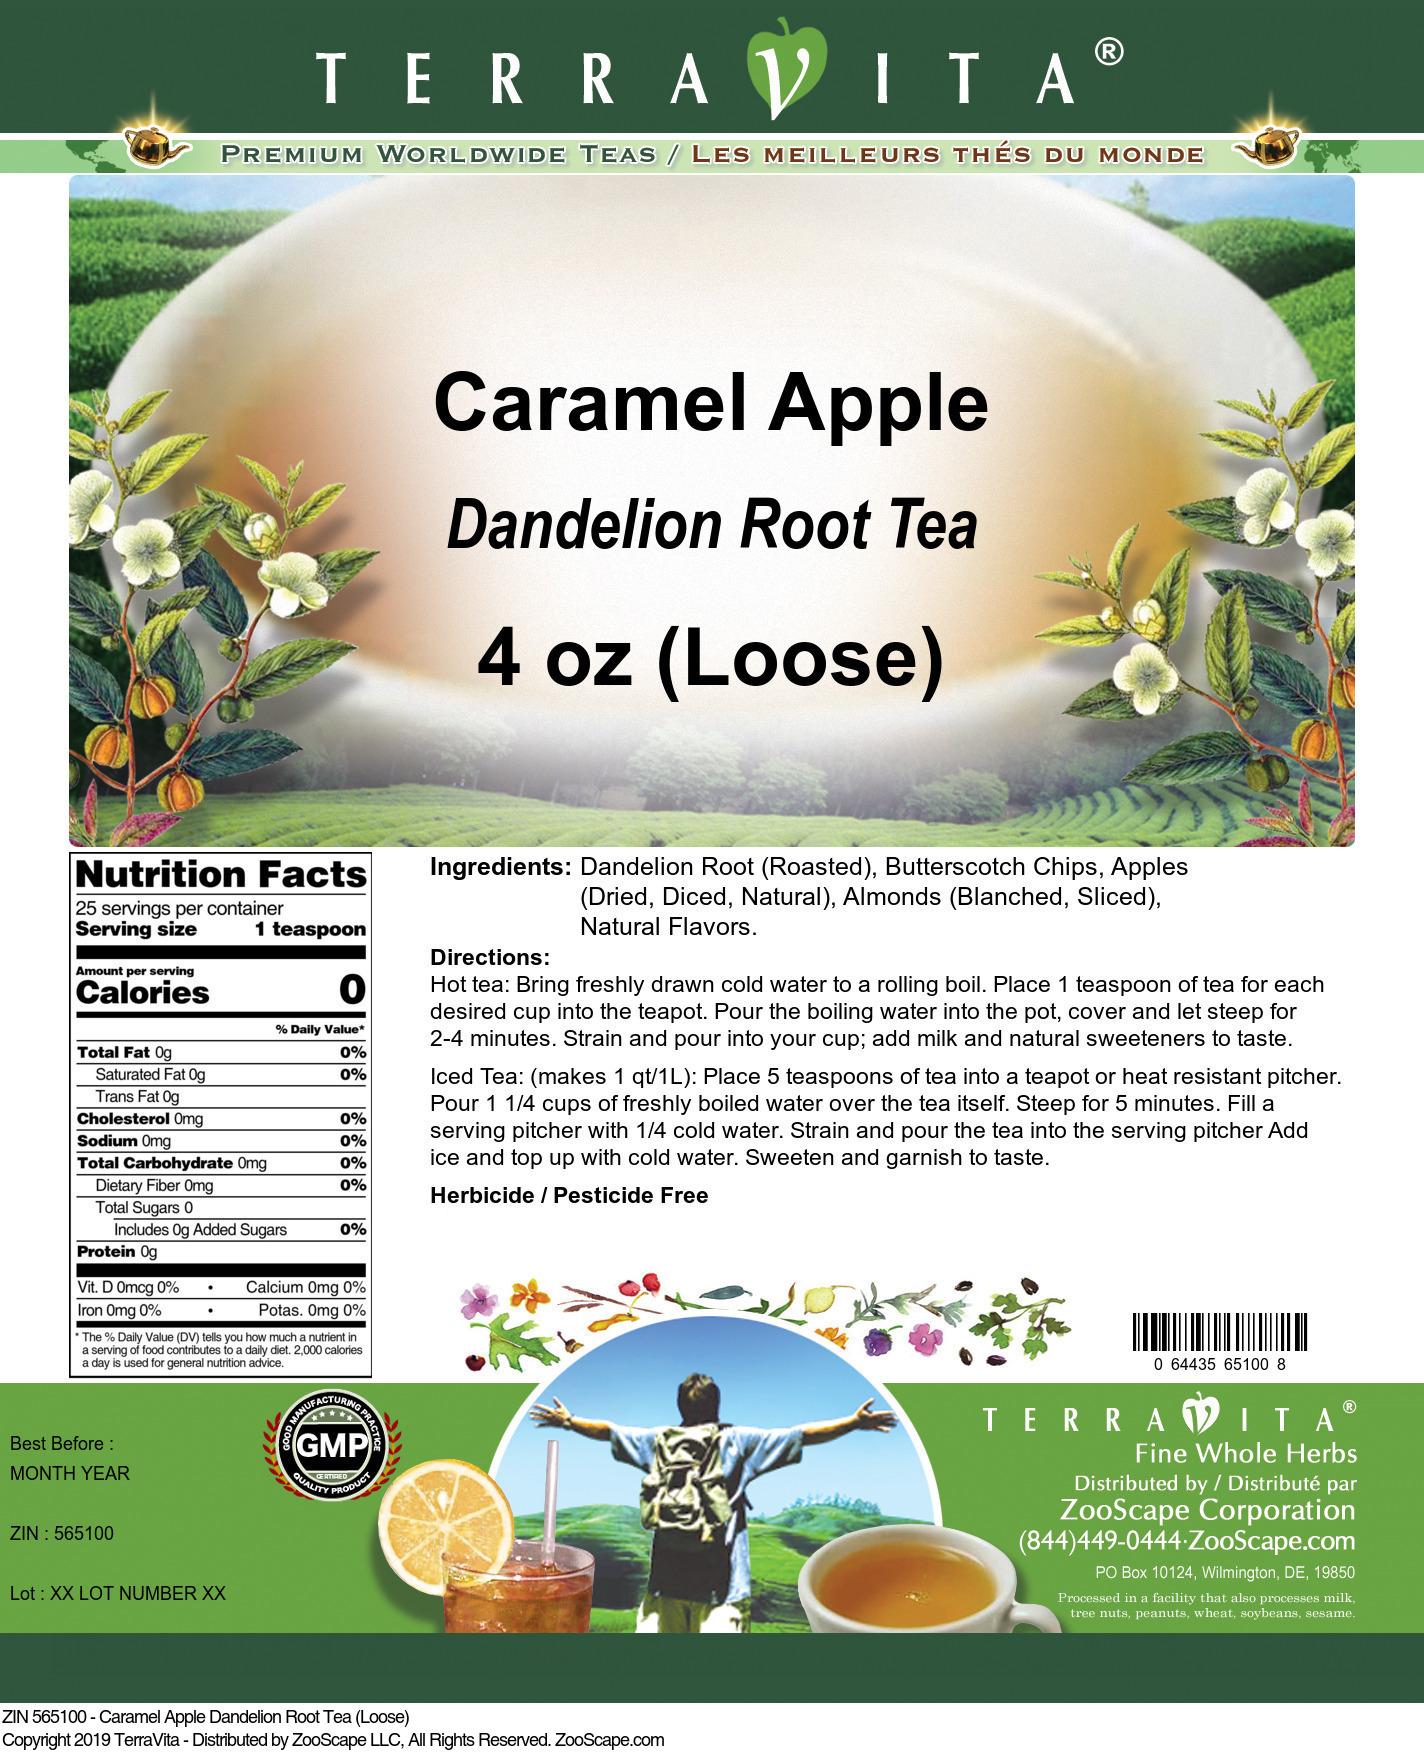 Caramel Apple Dandelion Root